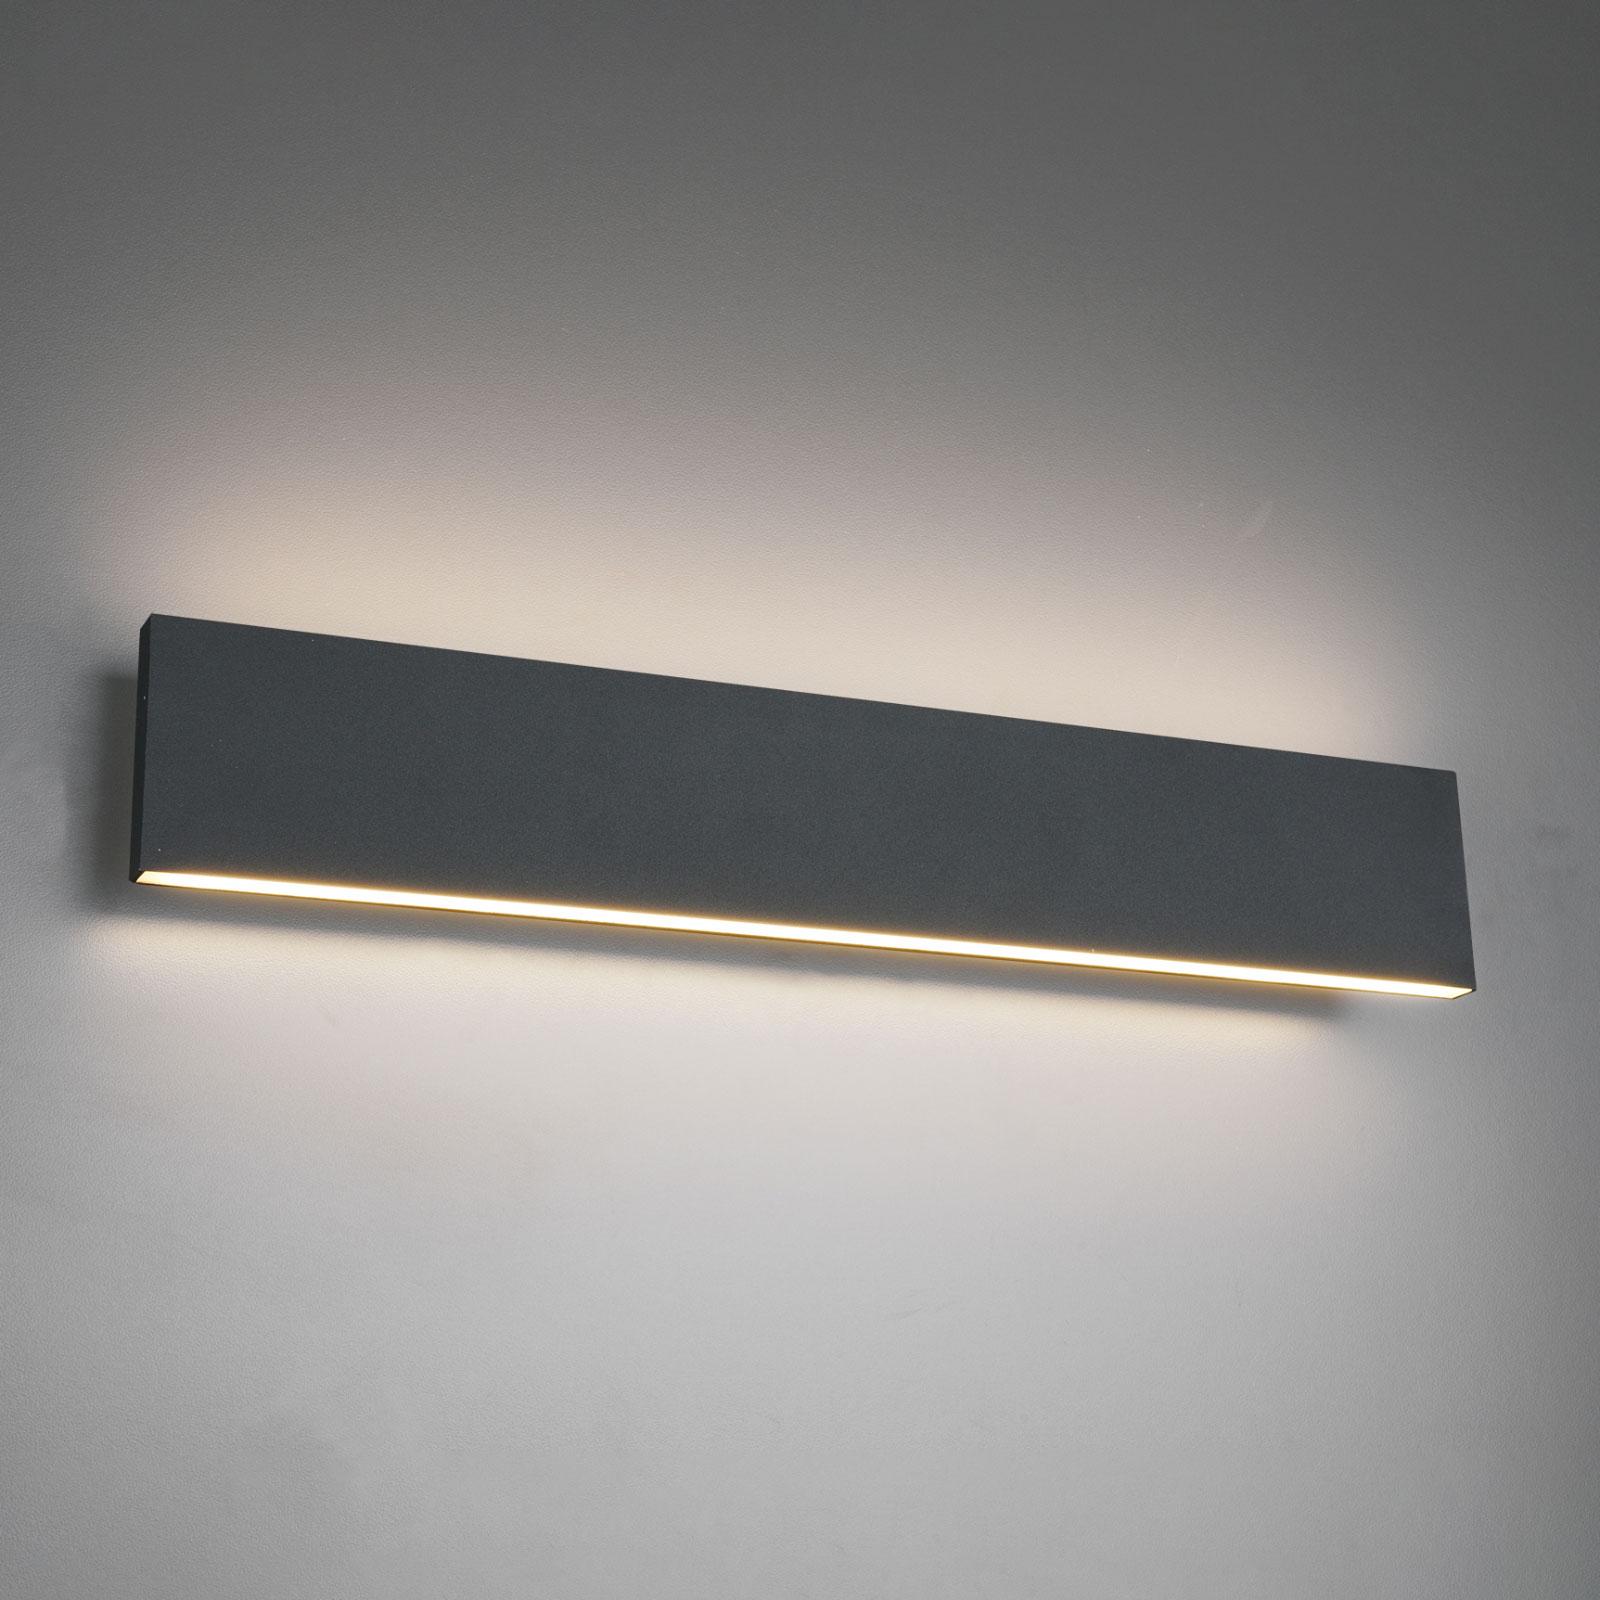 LED wandlamp Concha 47 cm, antraciet